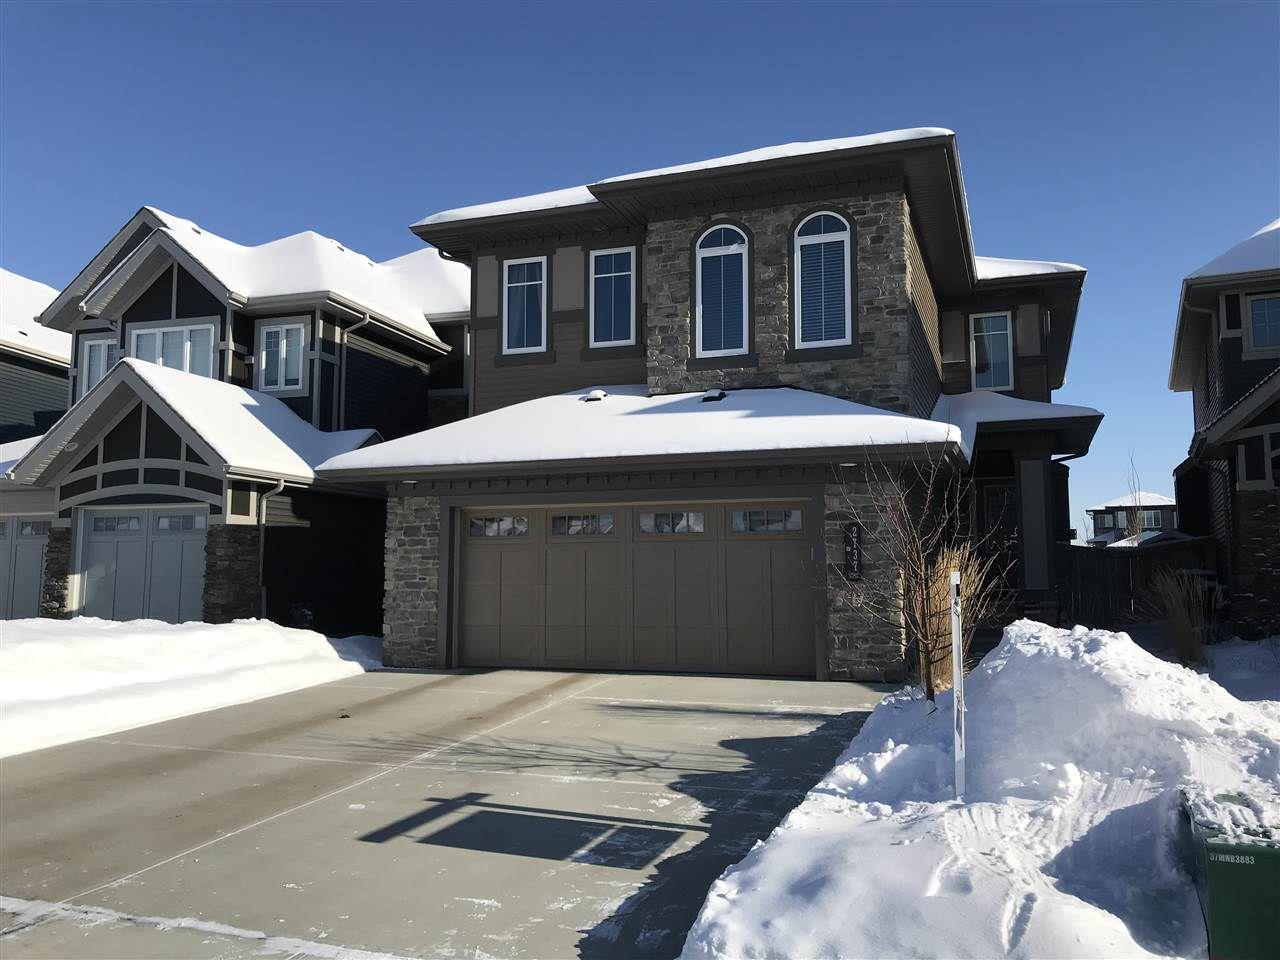 Main Photo: 2737 KIRKLAND Way in Edmonton: Zone 56 House for sale : MLS®# E4140755